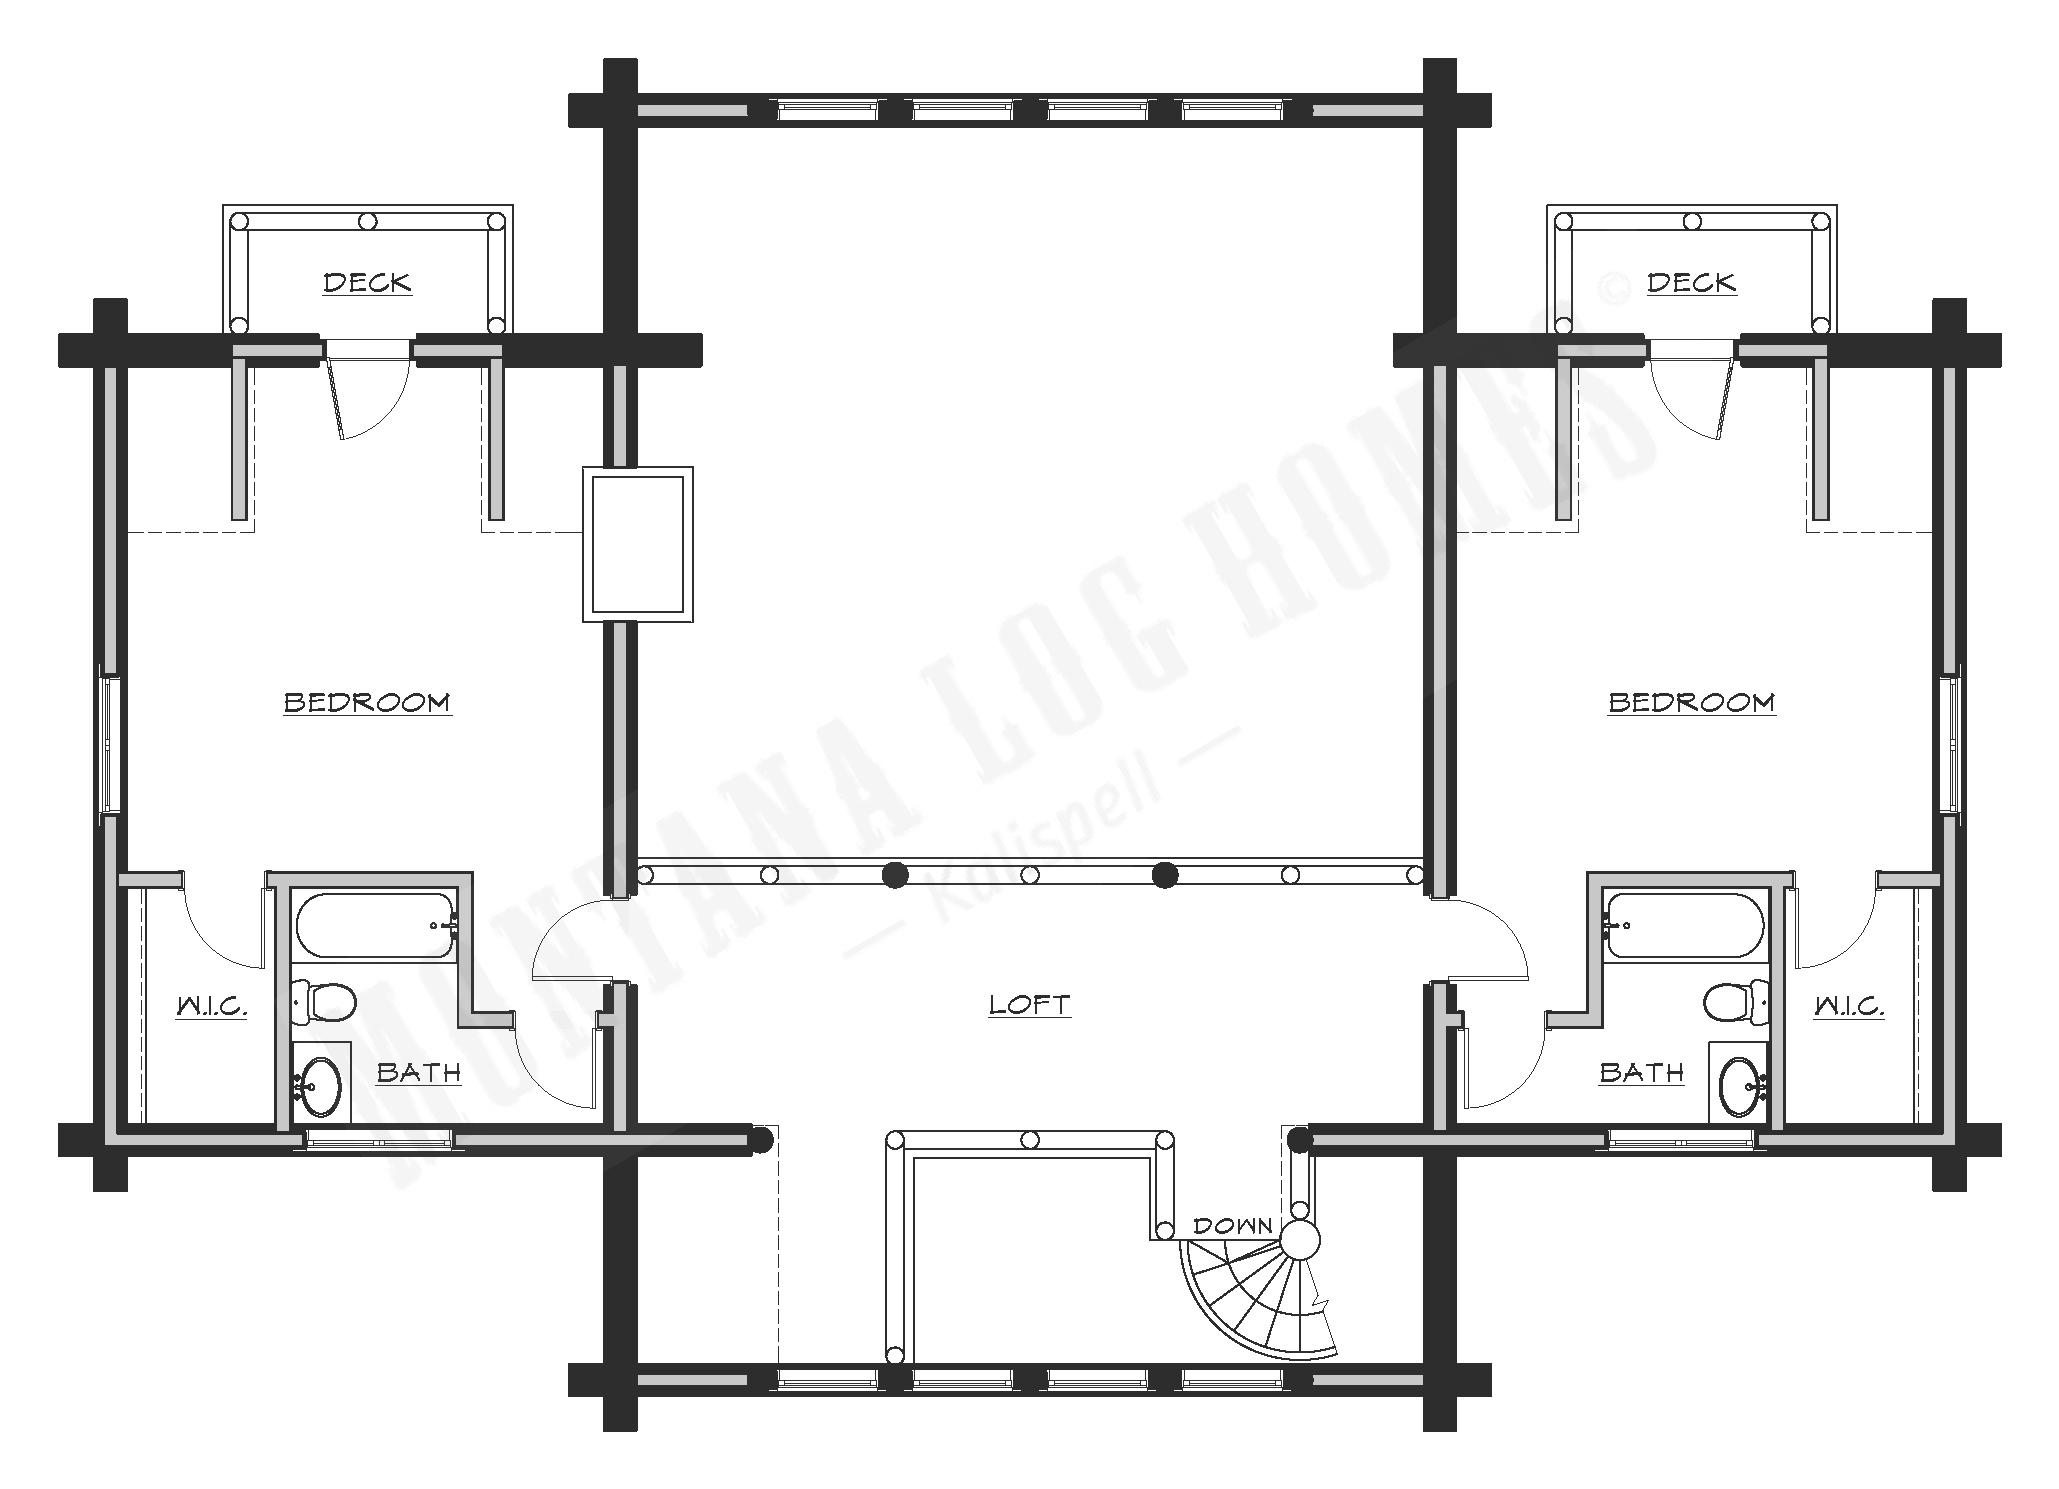 a floorplan of a log home